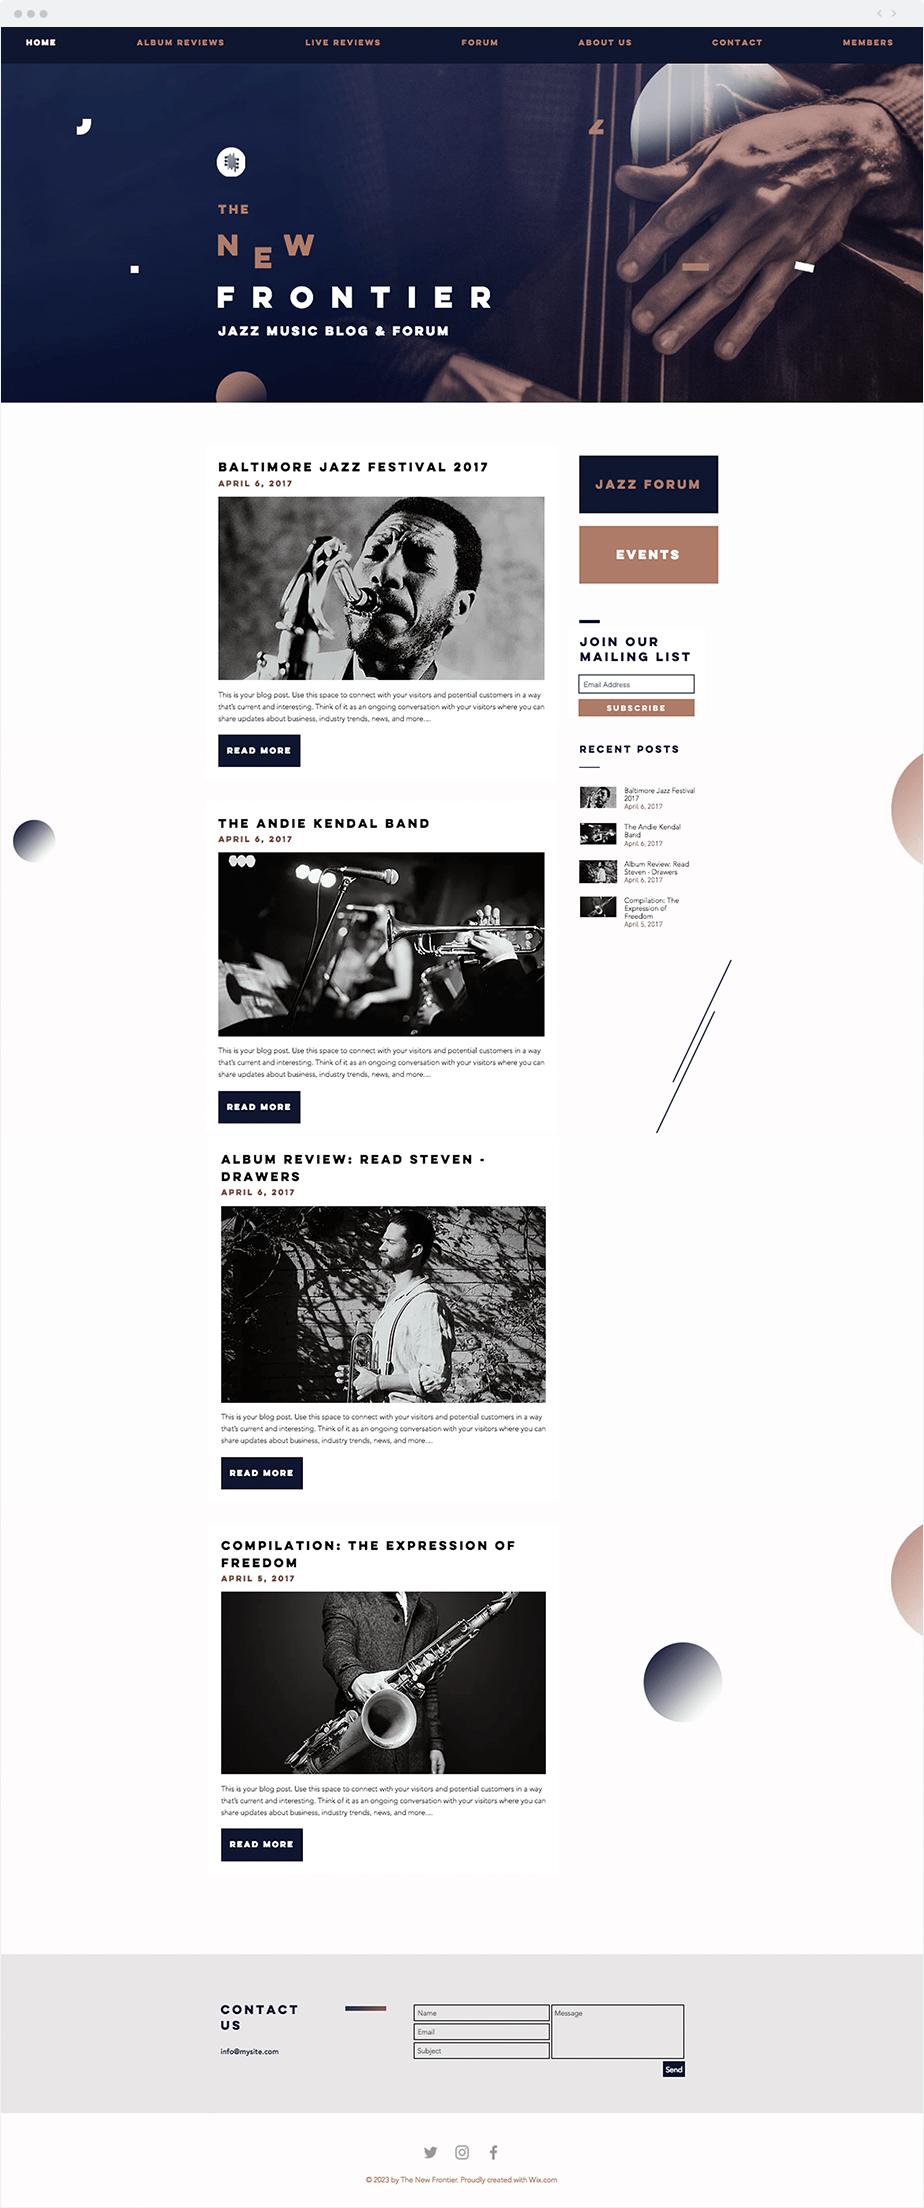 Template Wix Blog de música jazz